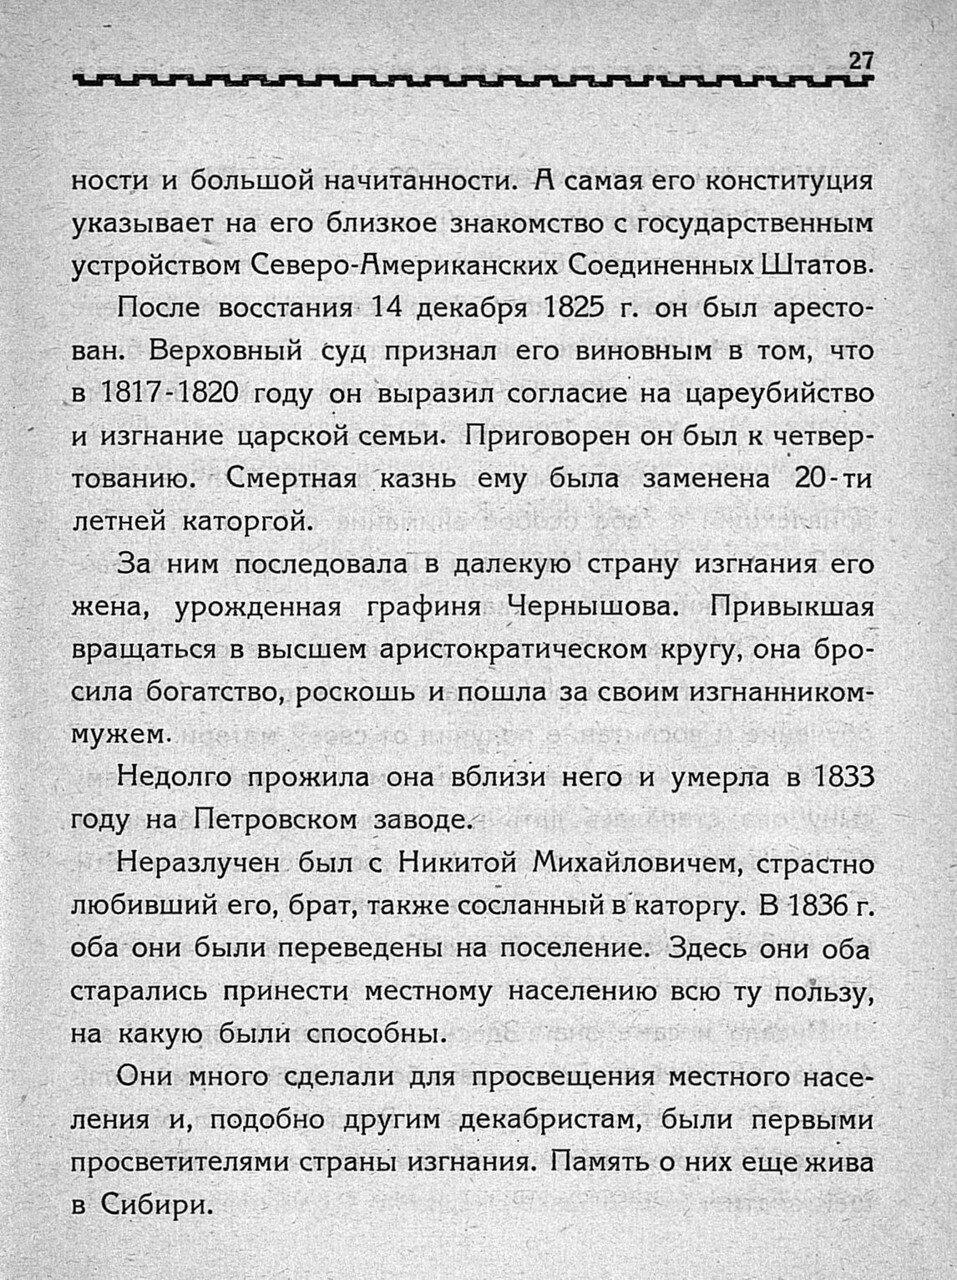 https://img-fotki.yandex.ru/get/112407/199368979.23/0_1bfadf_2f846015_XXXL.jpg